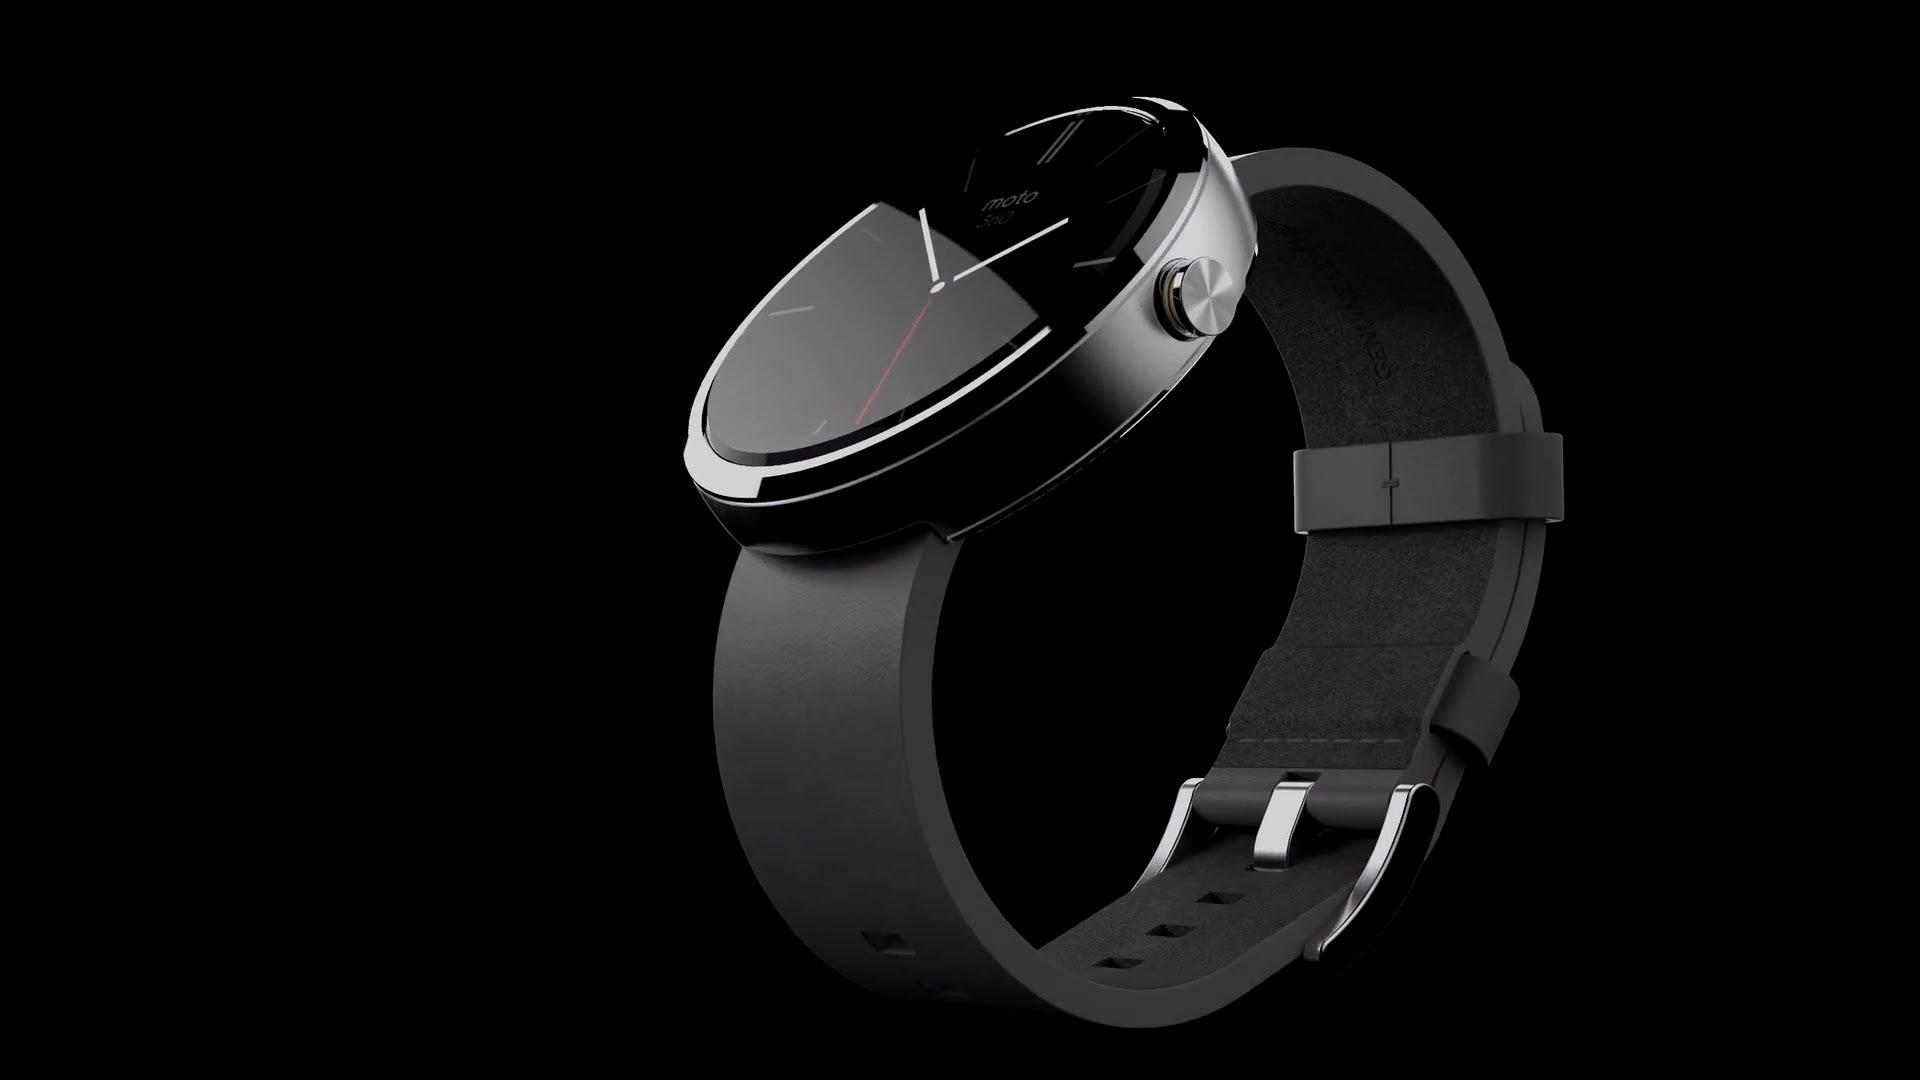 motorola 360 smartwatch. moto 360 (youtube) motorola smartwatch